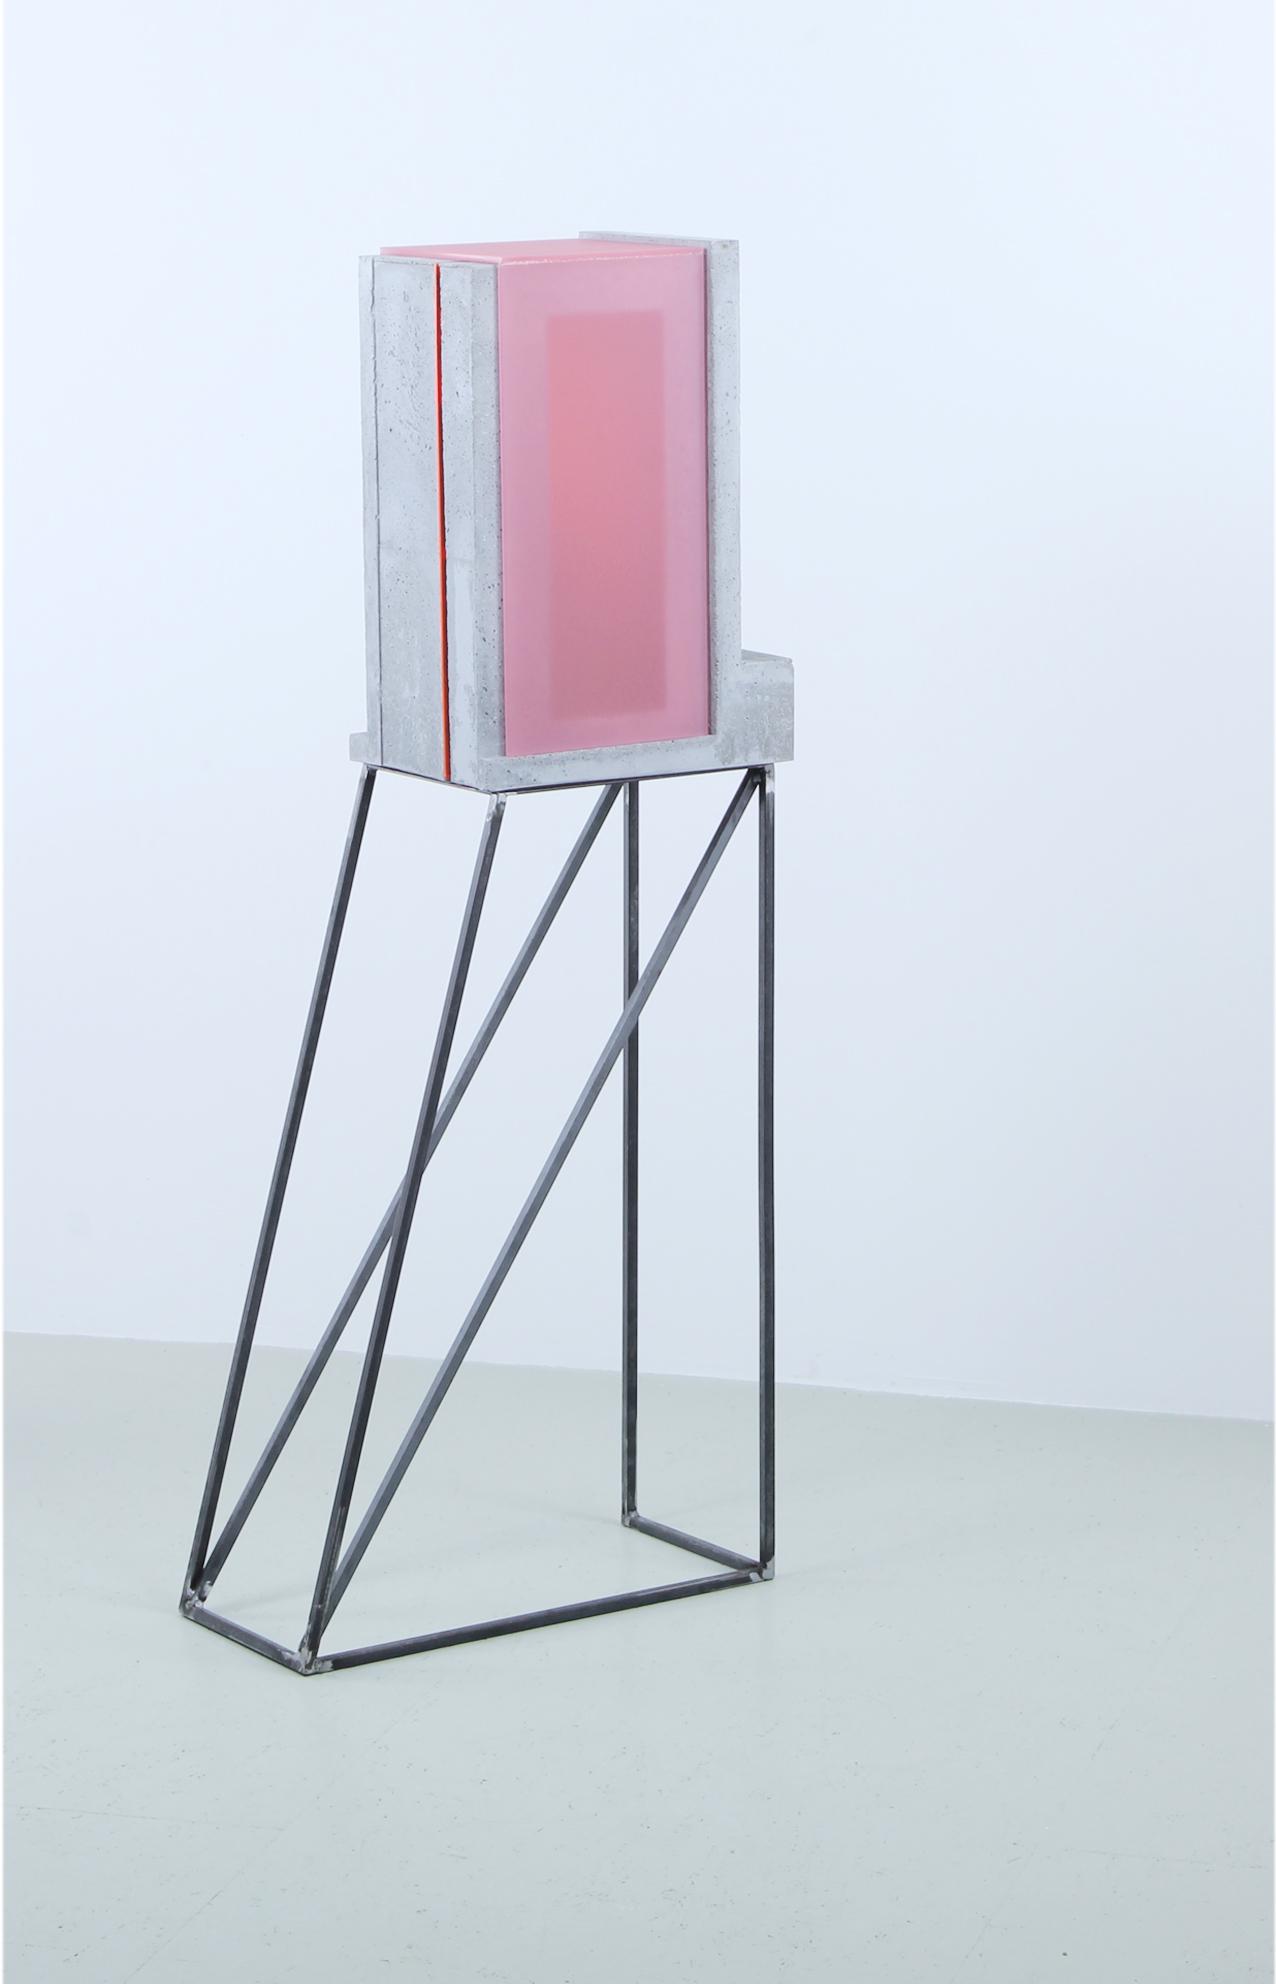 translucide IV | 2020 | Beton/Acrylglas/Metall | 54 x 25 x 132 cm